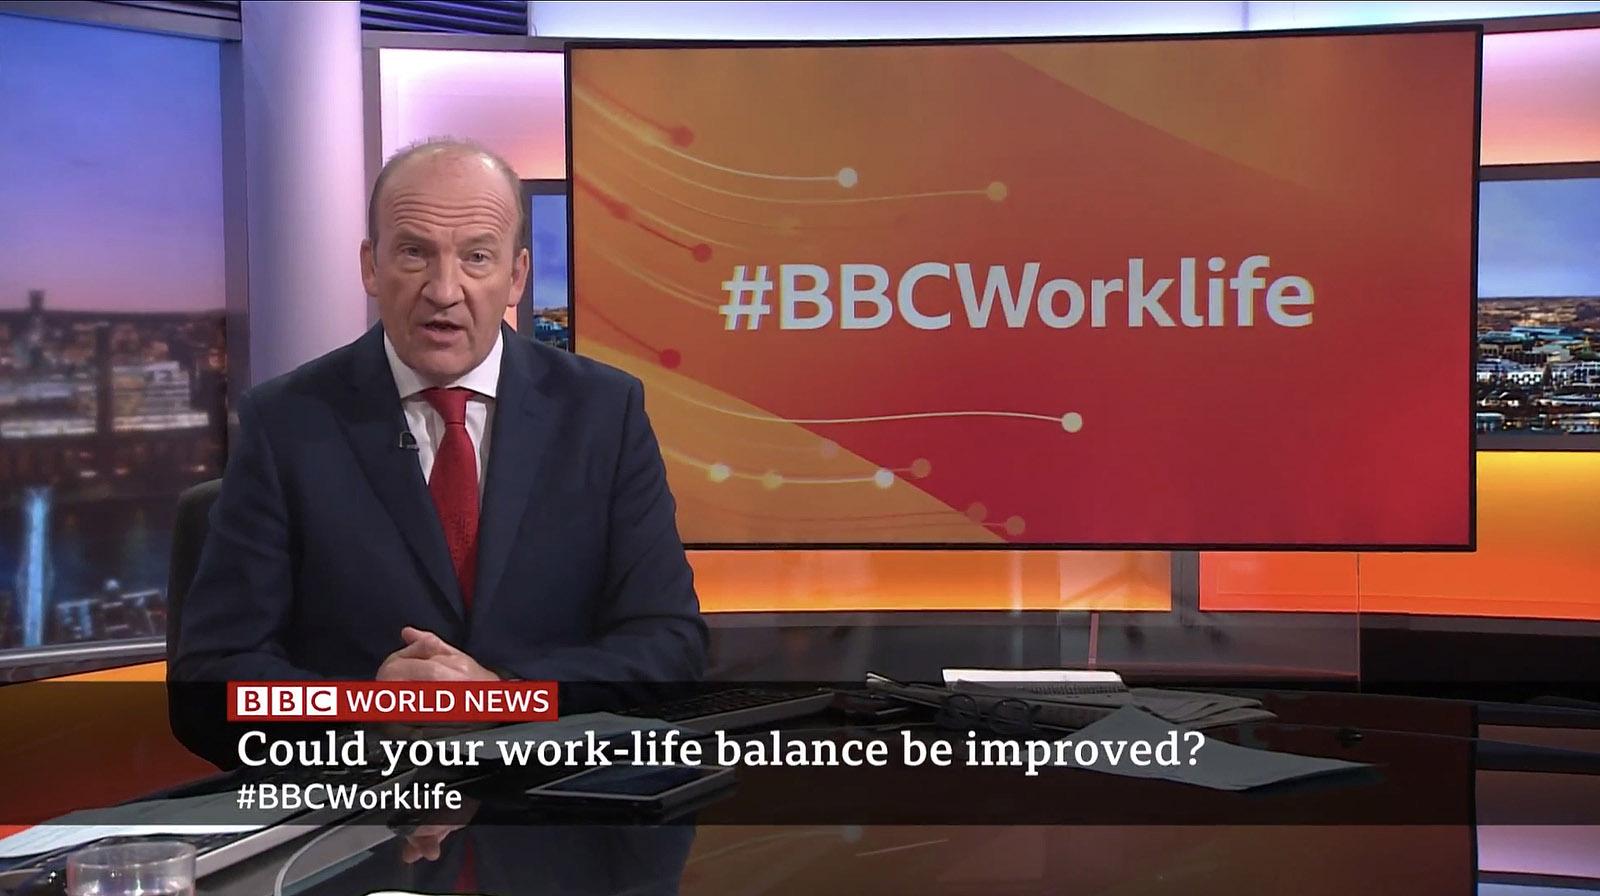 NCS_BBC-Worklife_010